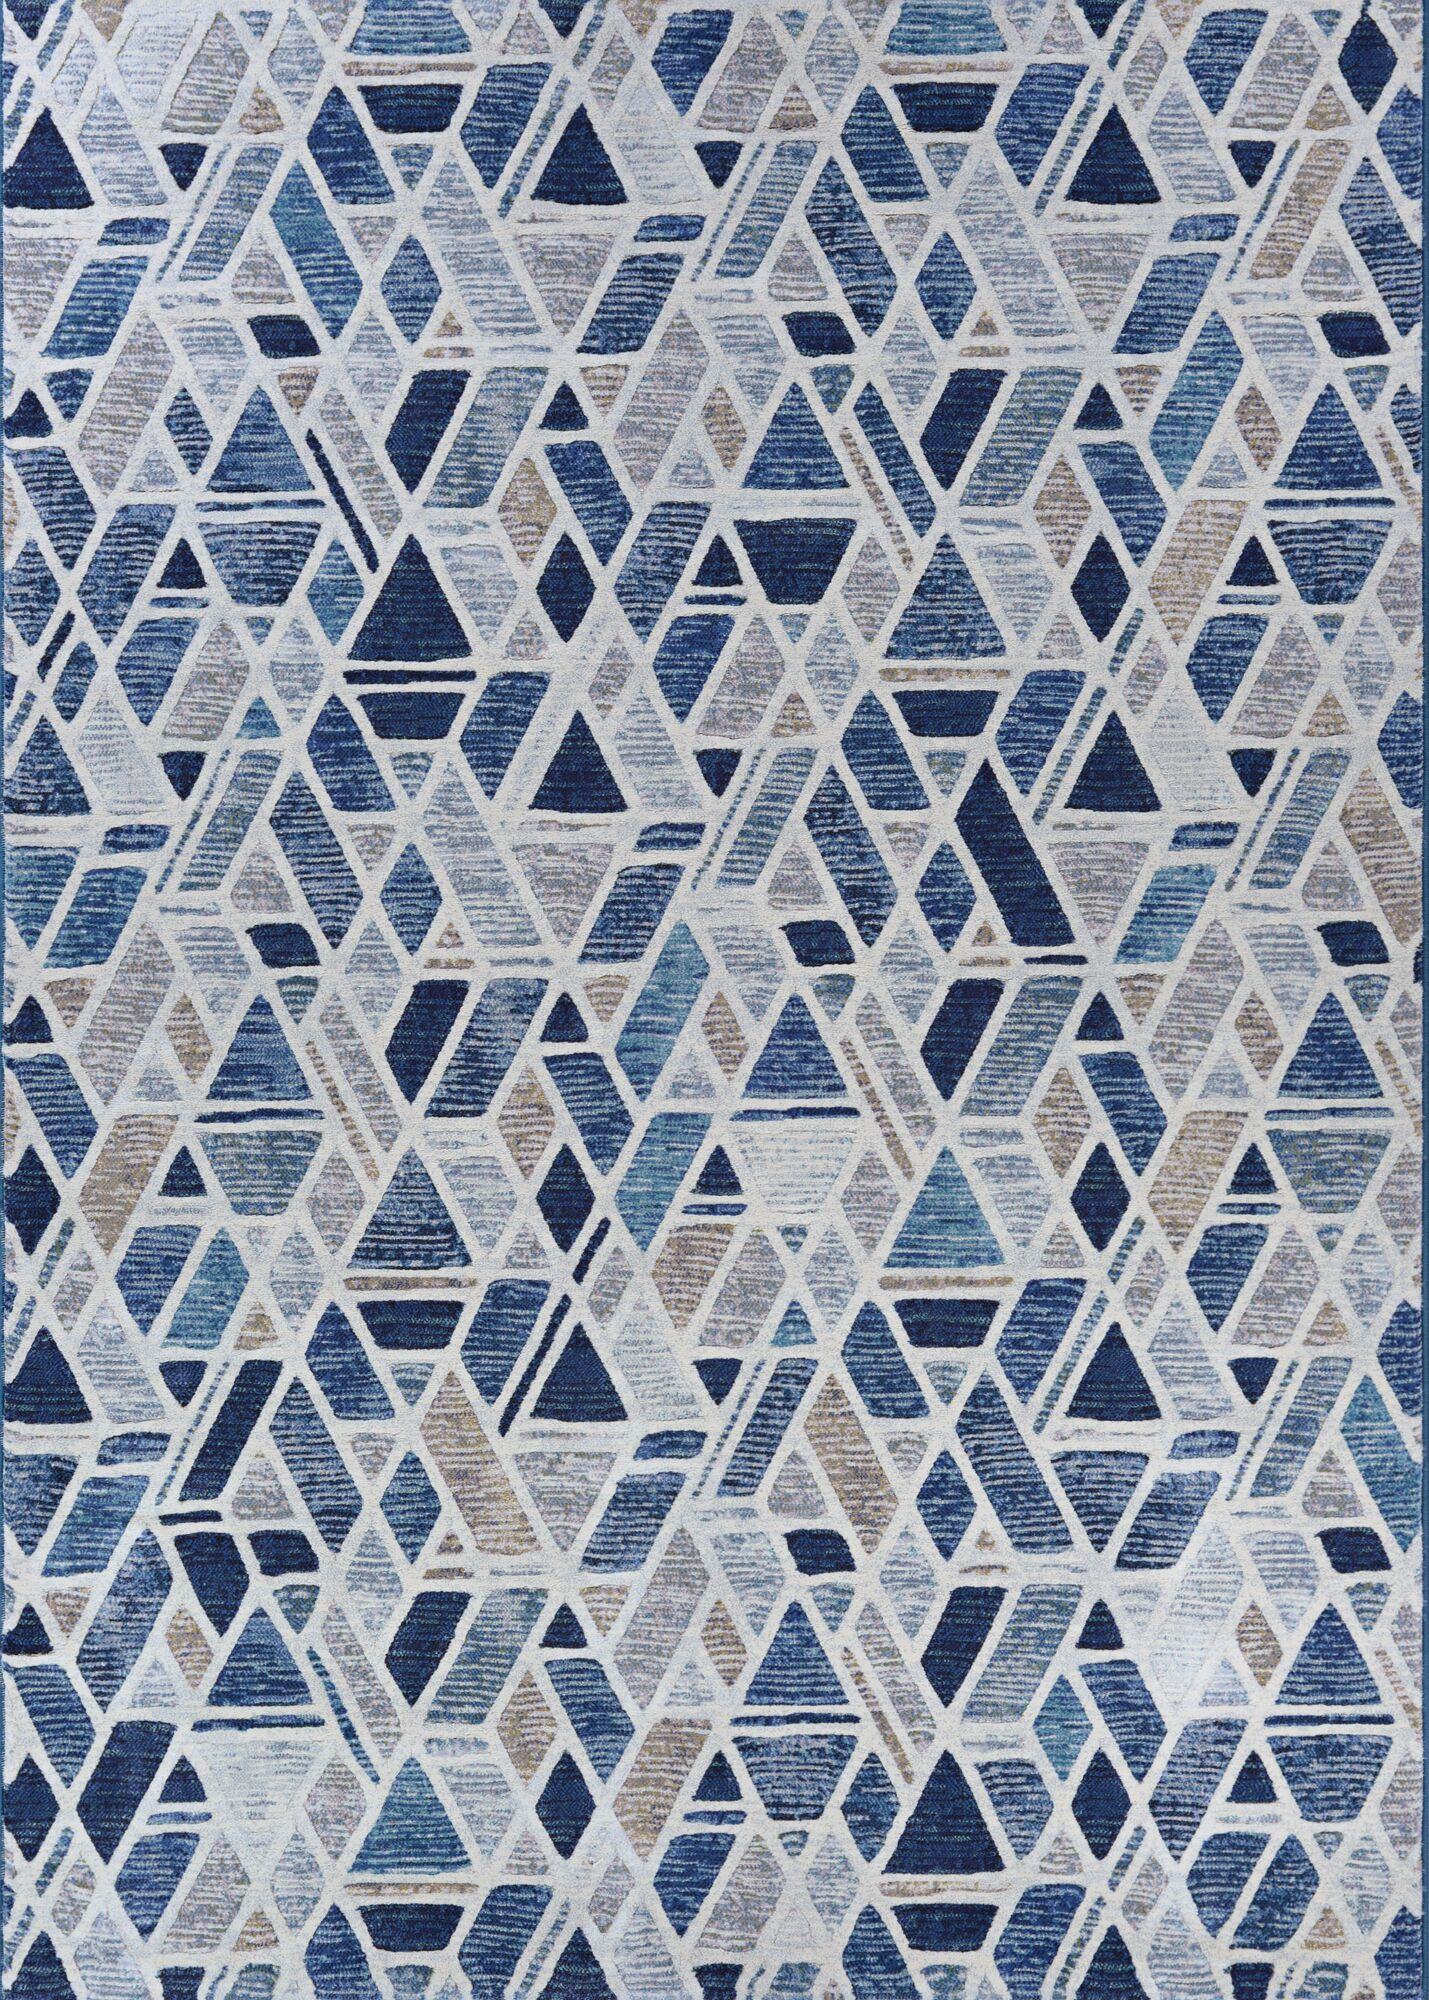 Sappington Bricks Graffiti Blue/Gray Area Rug Rug Size: Rectangle 6'6